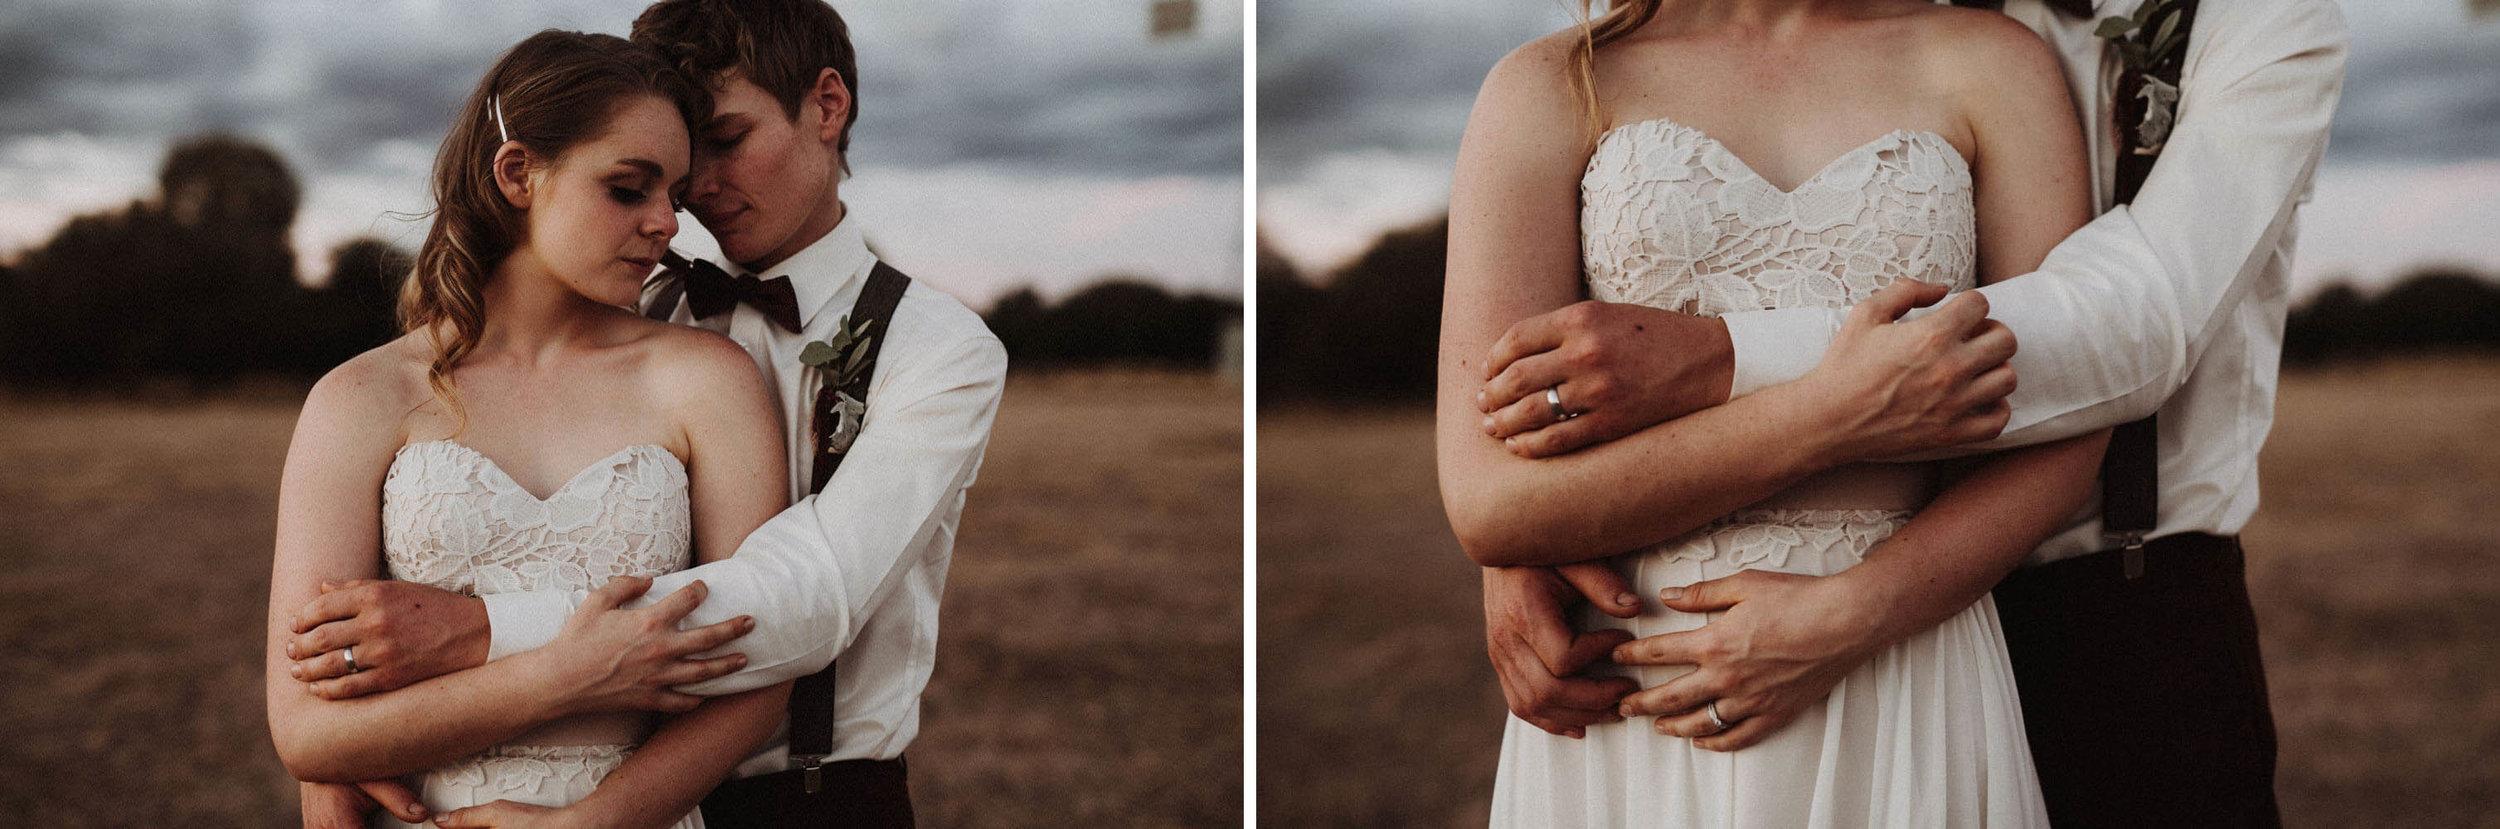 australian-wedding-photography_213(4080)2.jpg